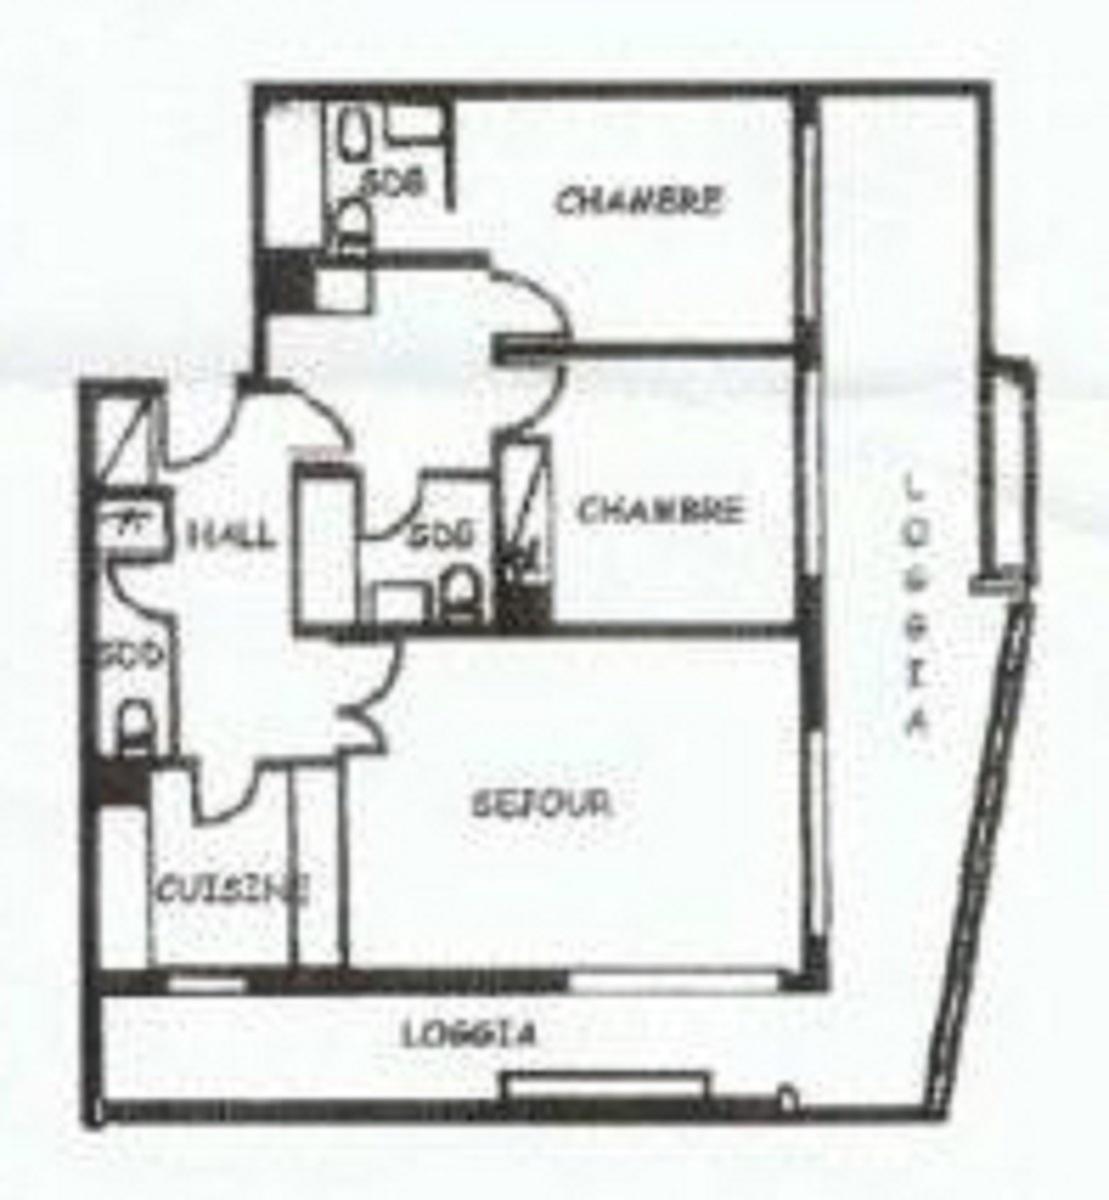 location acanthes 3 pi ces usage mixte carre d 39 or monaco monte carlo. Black Bedroom Furniture Sets. Home Design Ideas